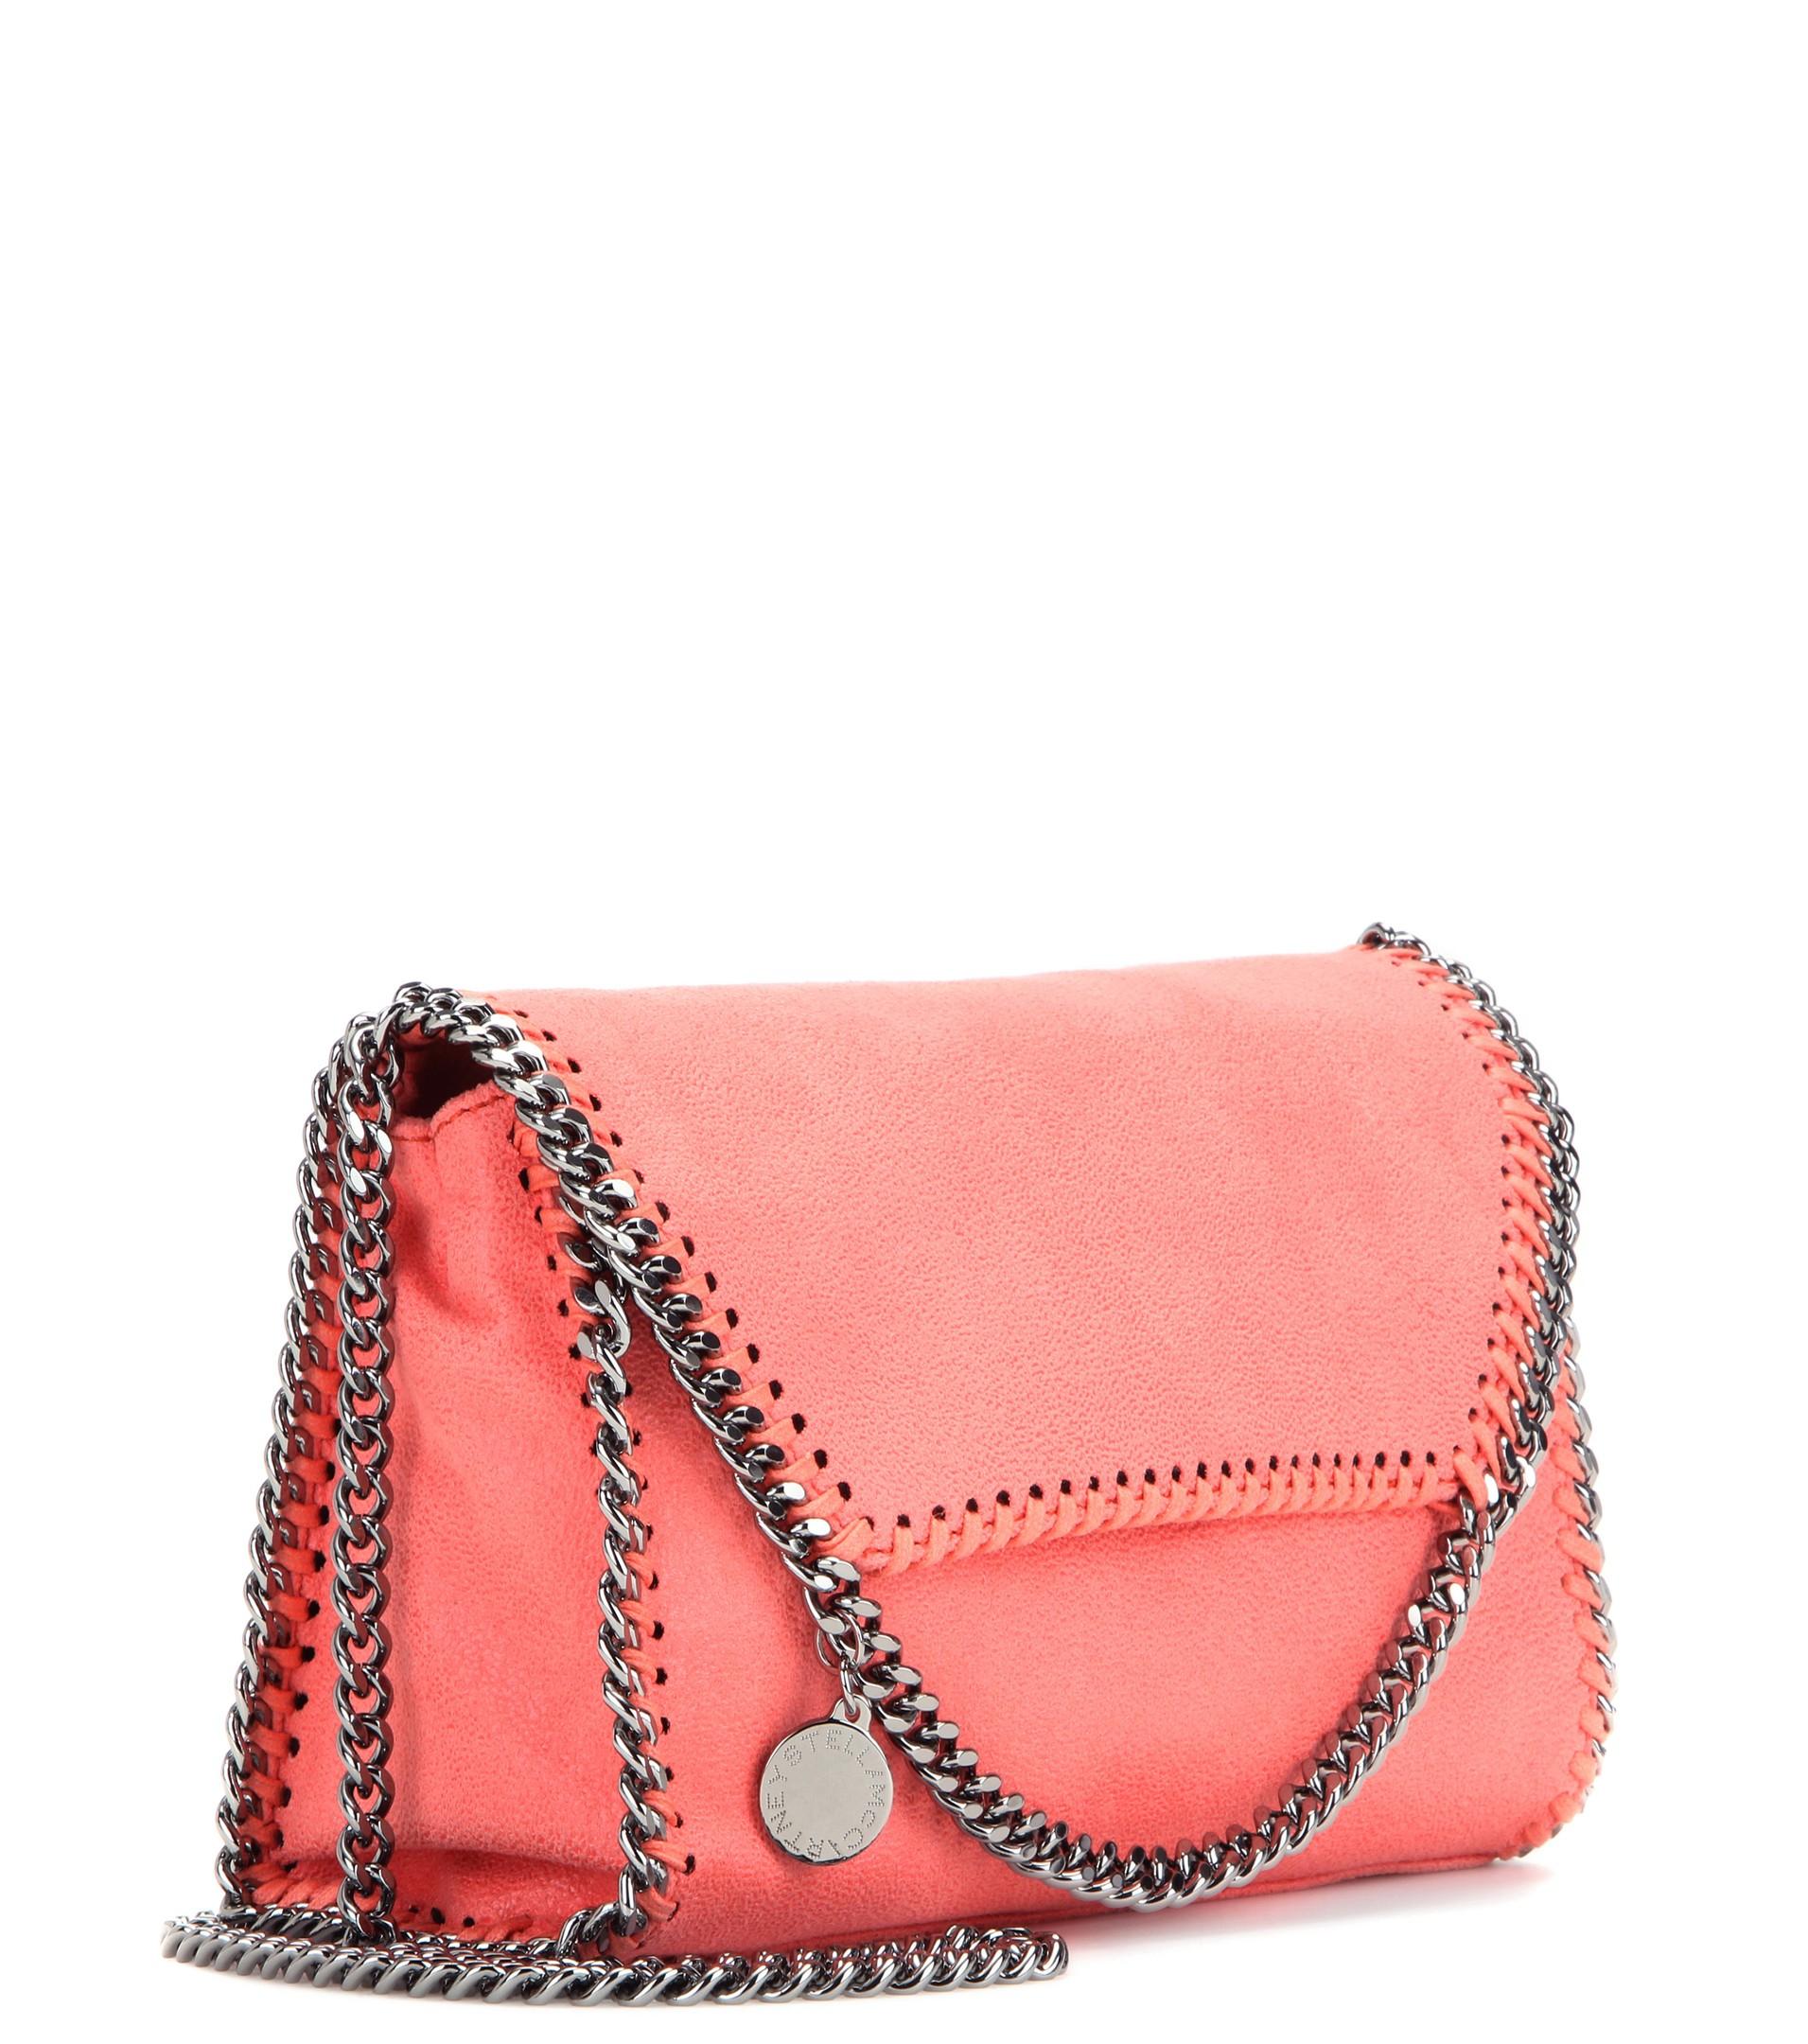 Stella McCartney Coral Pink Falabella Medium shoulder bag Online Cheap Online Discount Very Cheap Shop Offer SikHBKpwt